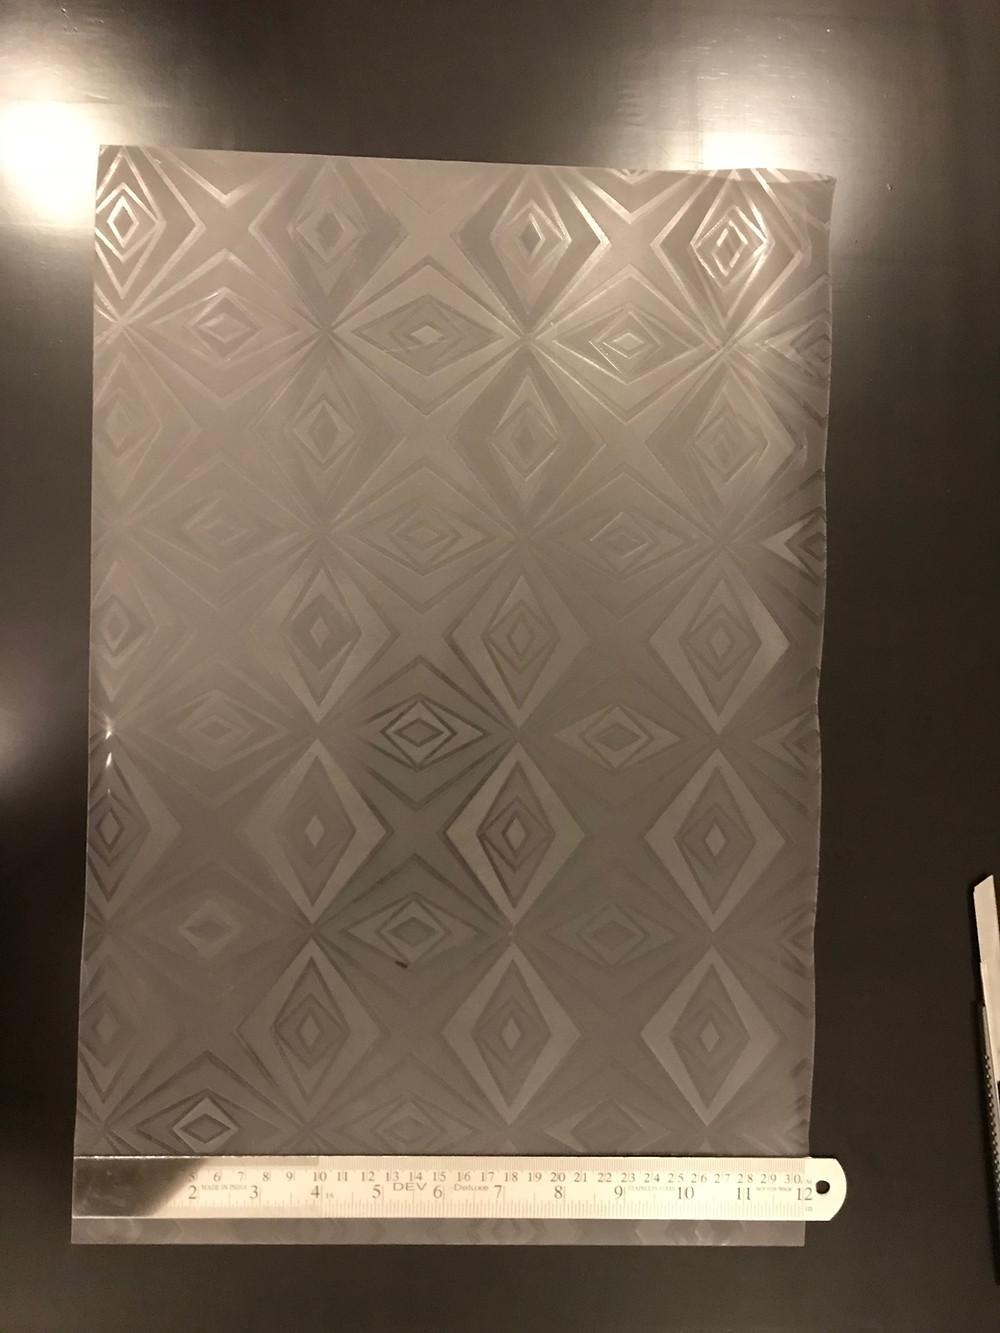 Plastic sheet with metal ruler